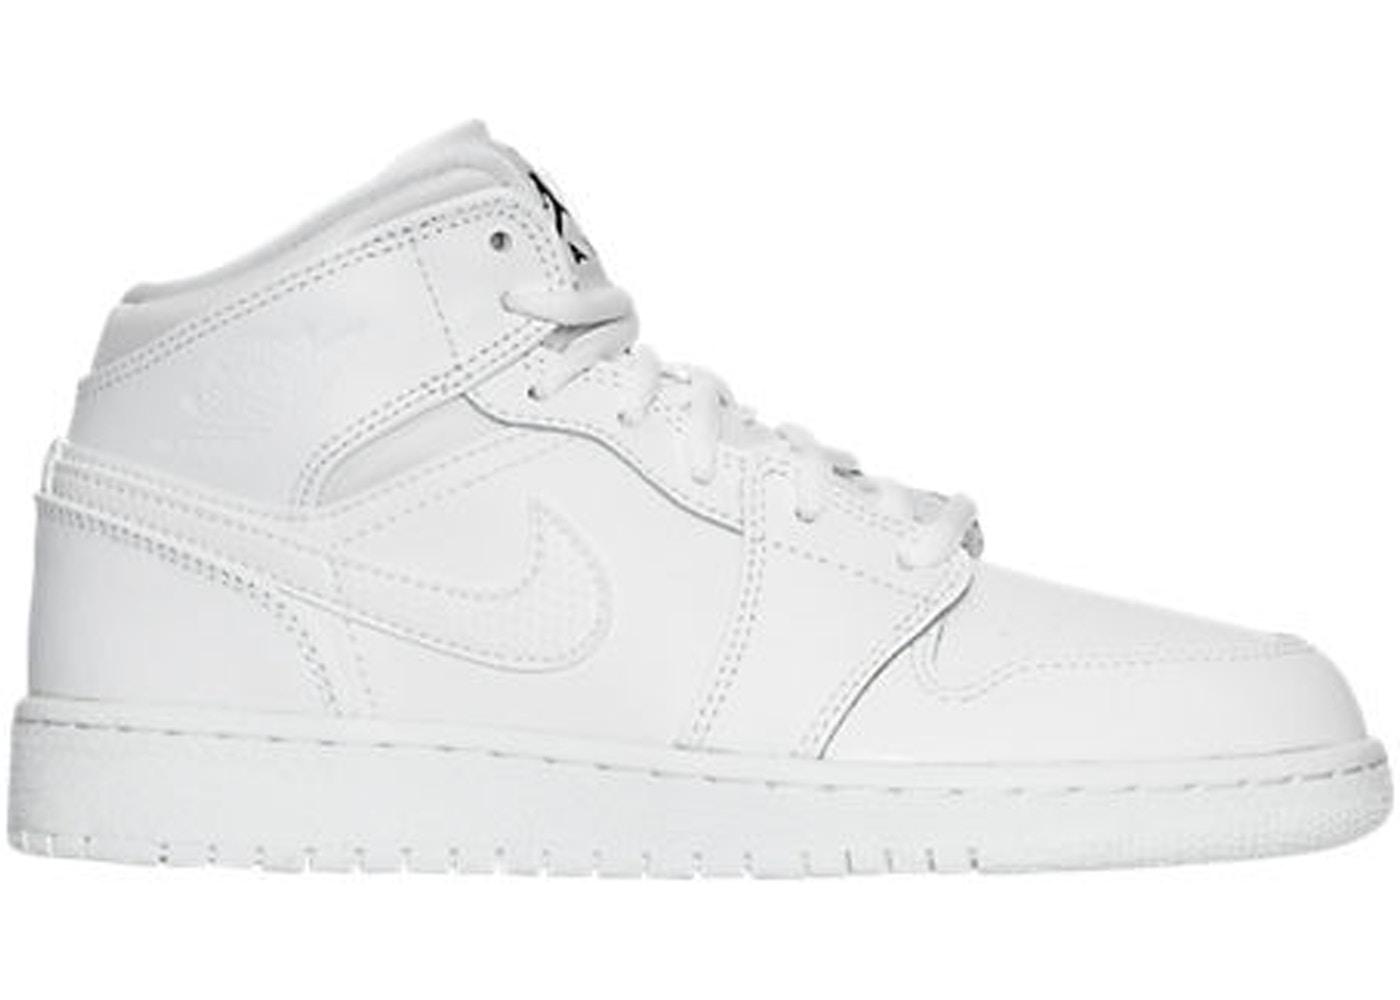 Jordan 1 Retro Mid White 2017 Gs 554725 110